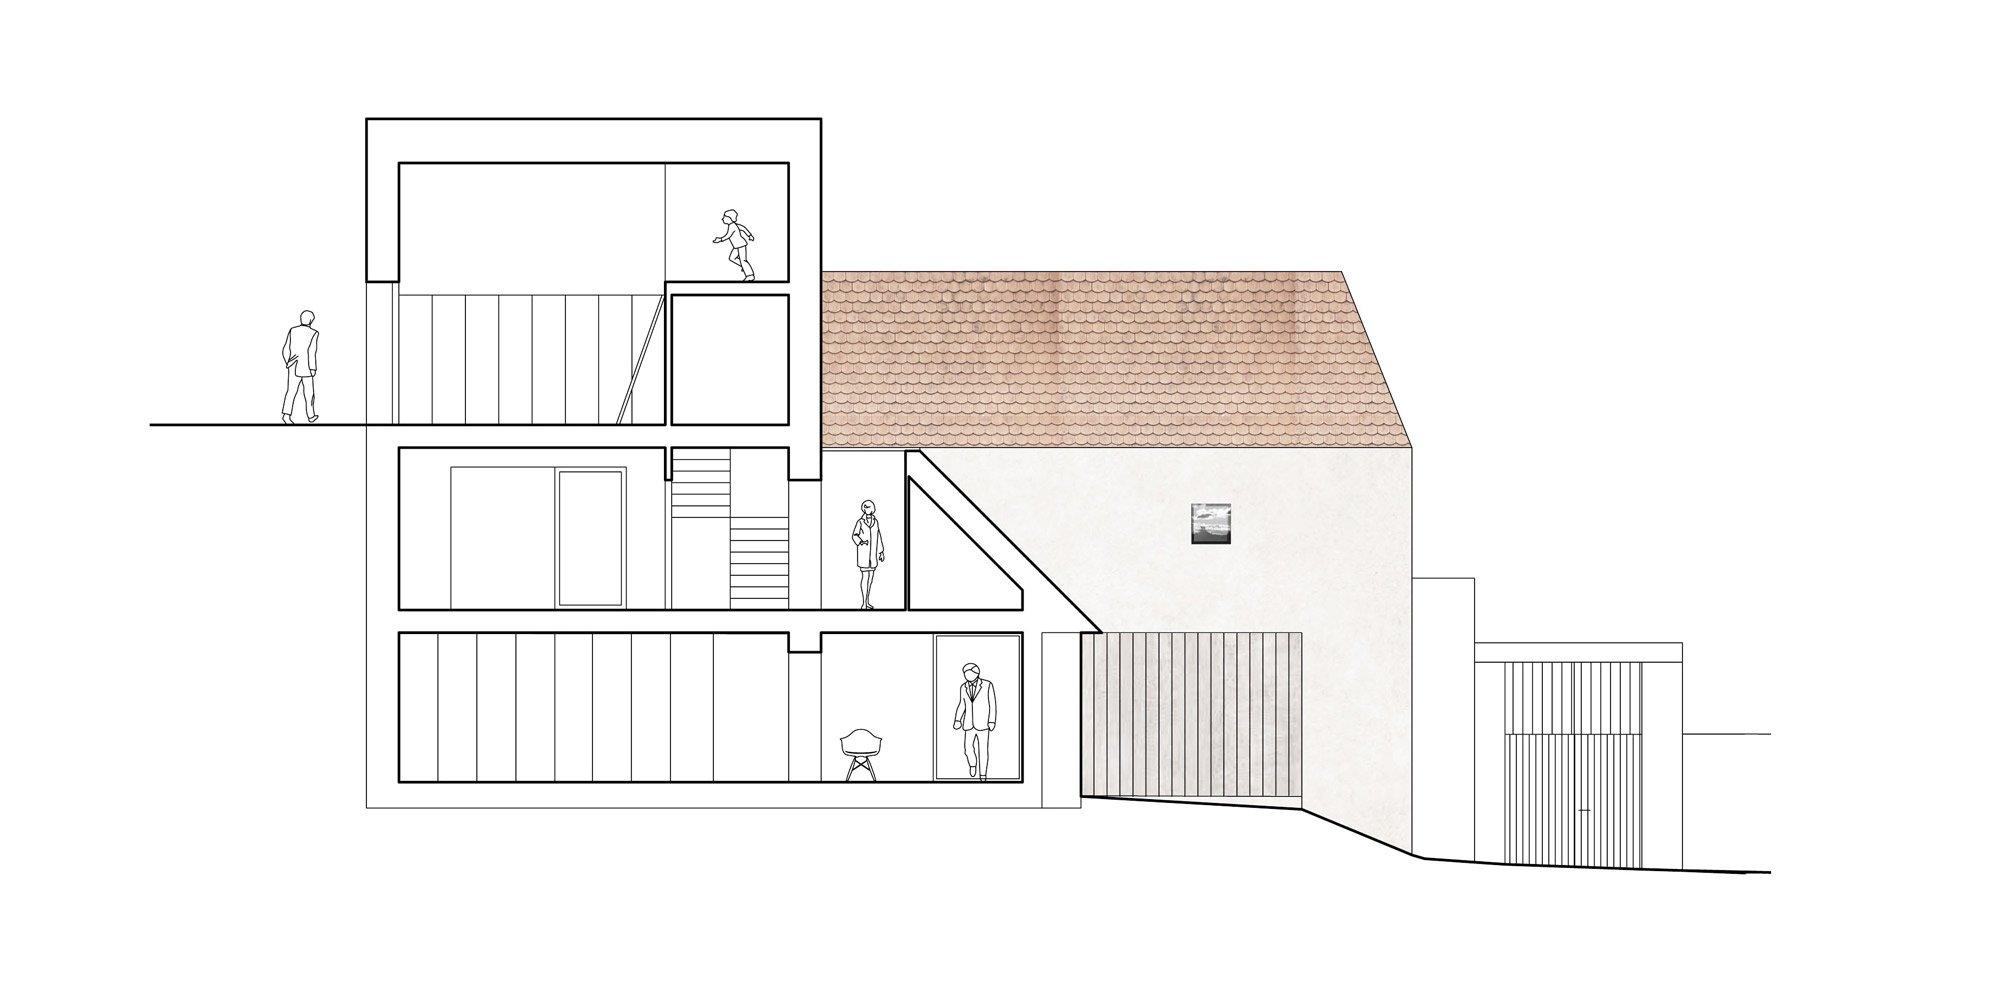 Sezione AA © Atelier 111 architekti